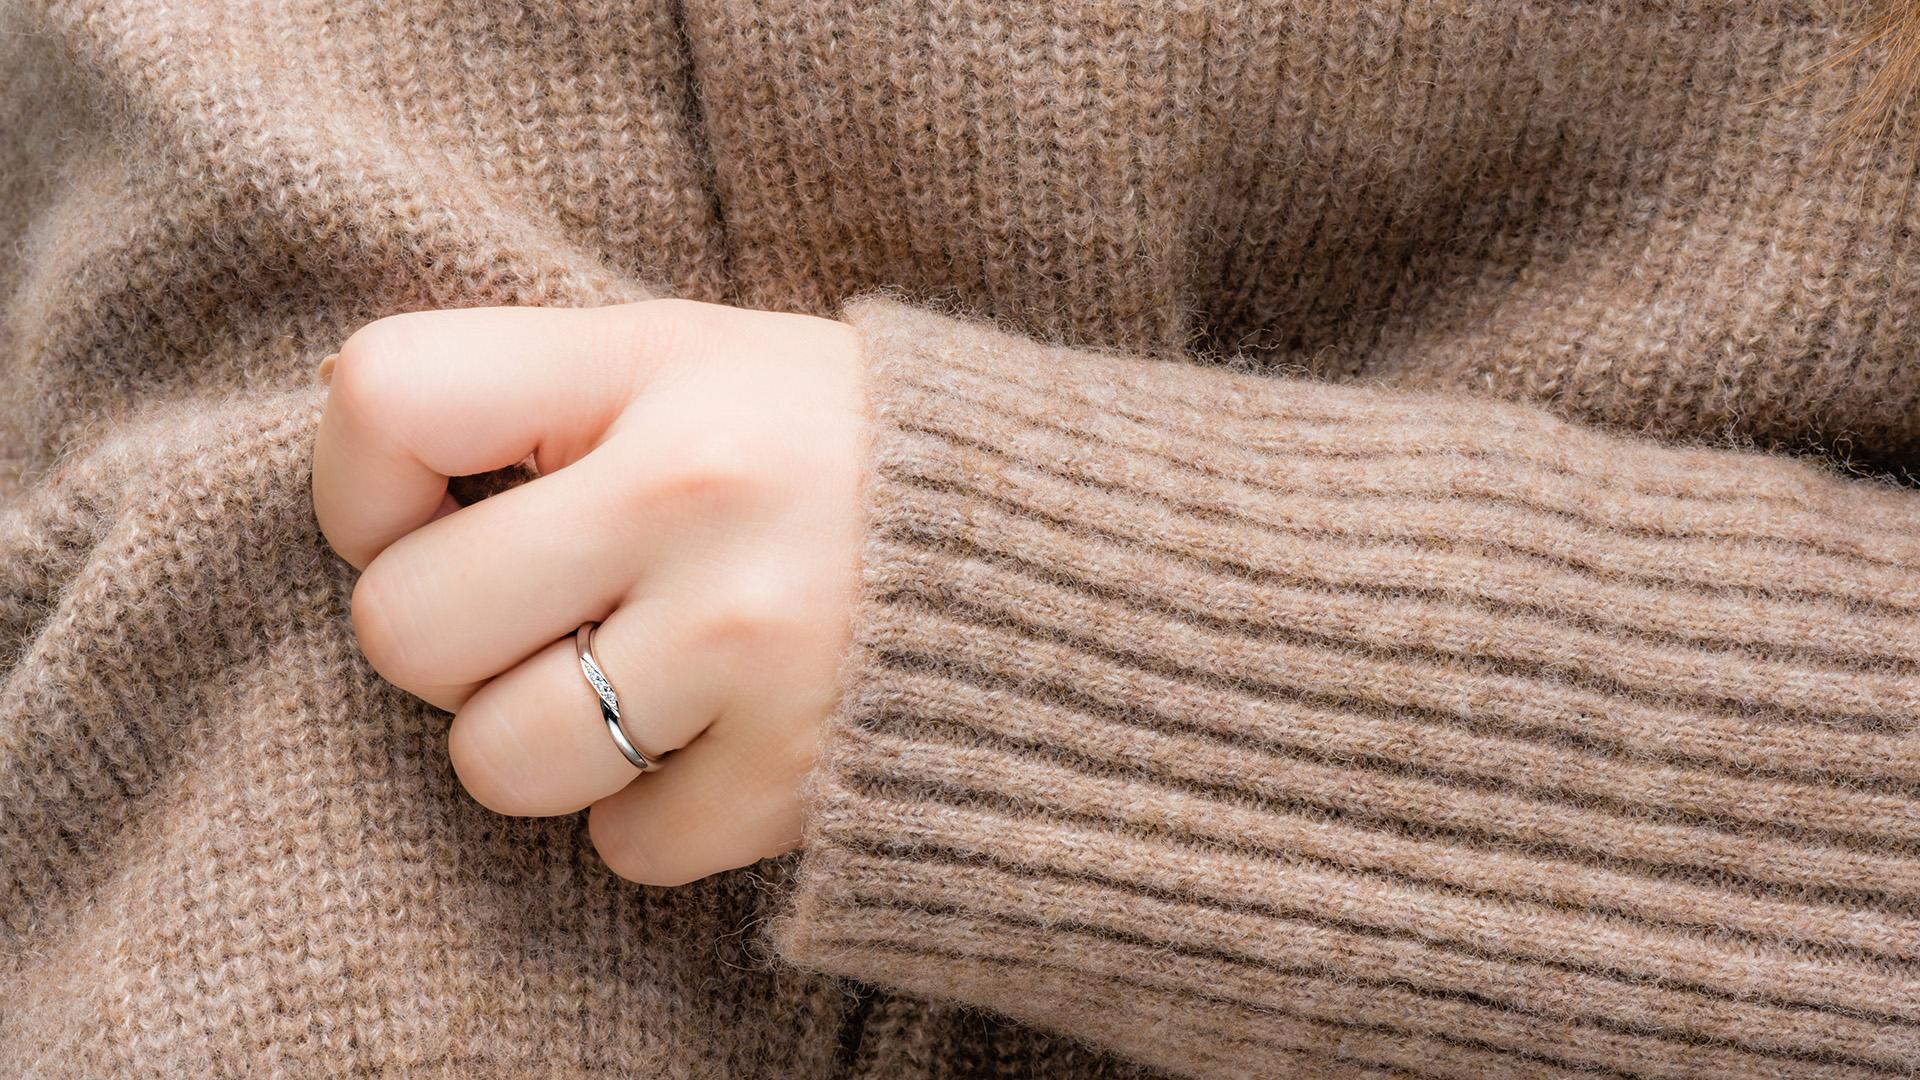 clementia クレメンティア | 結婚指輪サムネイル 2